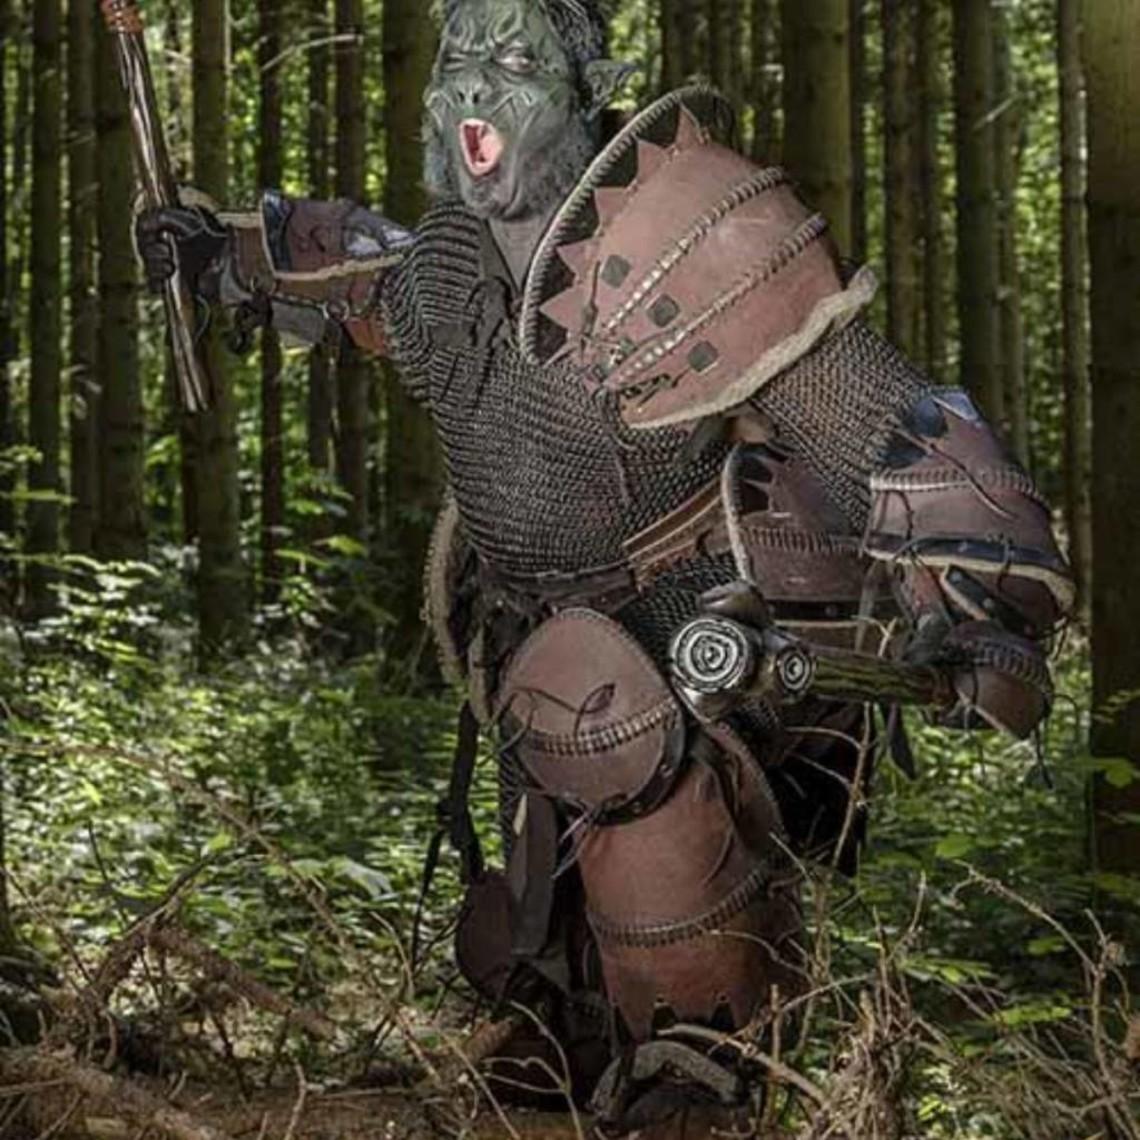 Epic Armoury Leder Orc Armschienen Uzgush, braun, Paar